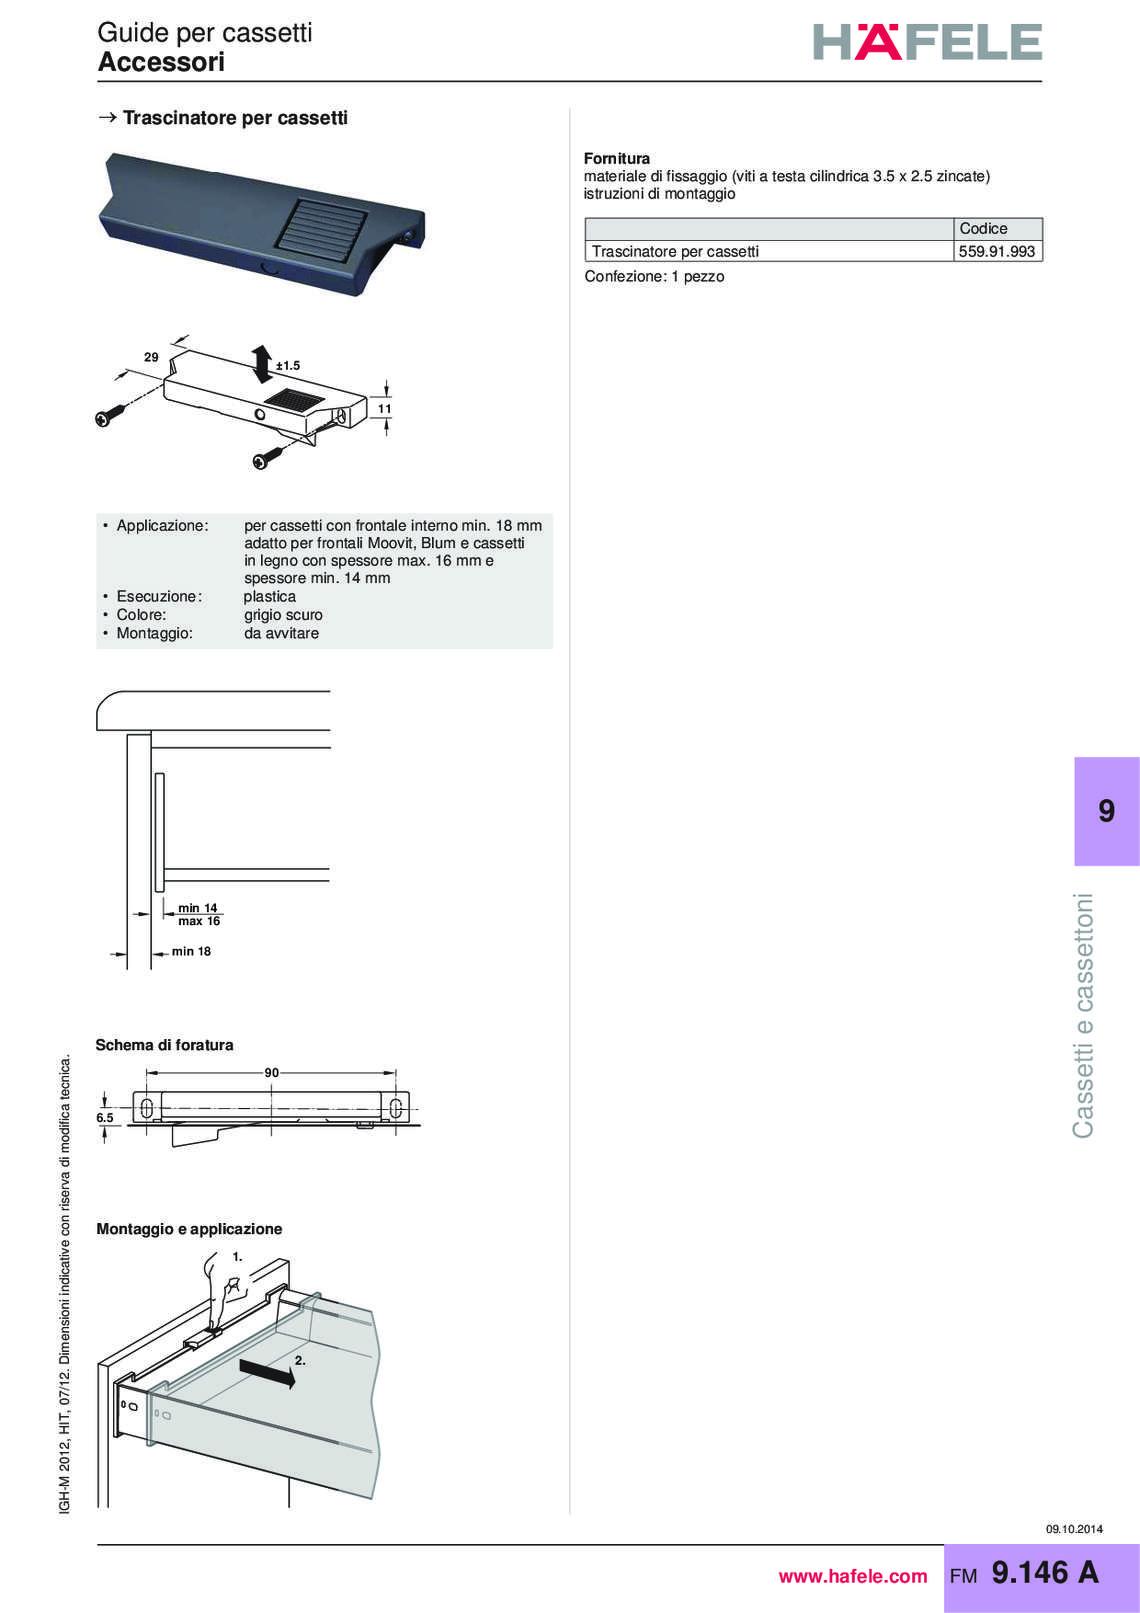 hafele-spondine-e-guide-per-mobili_40_206.jpg